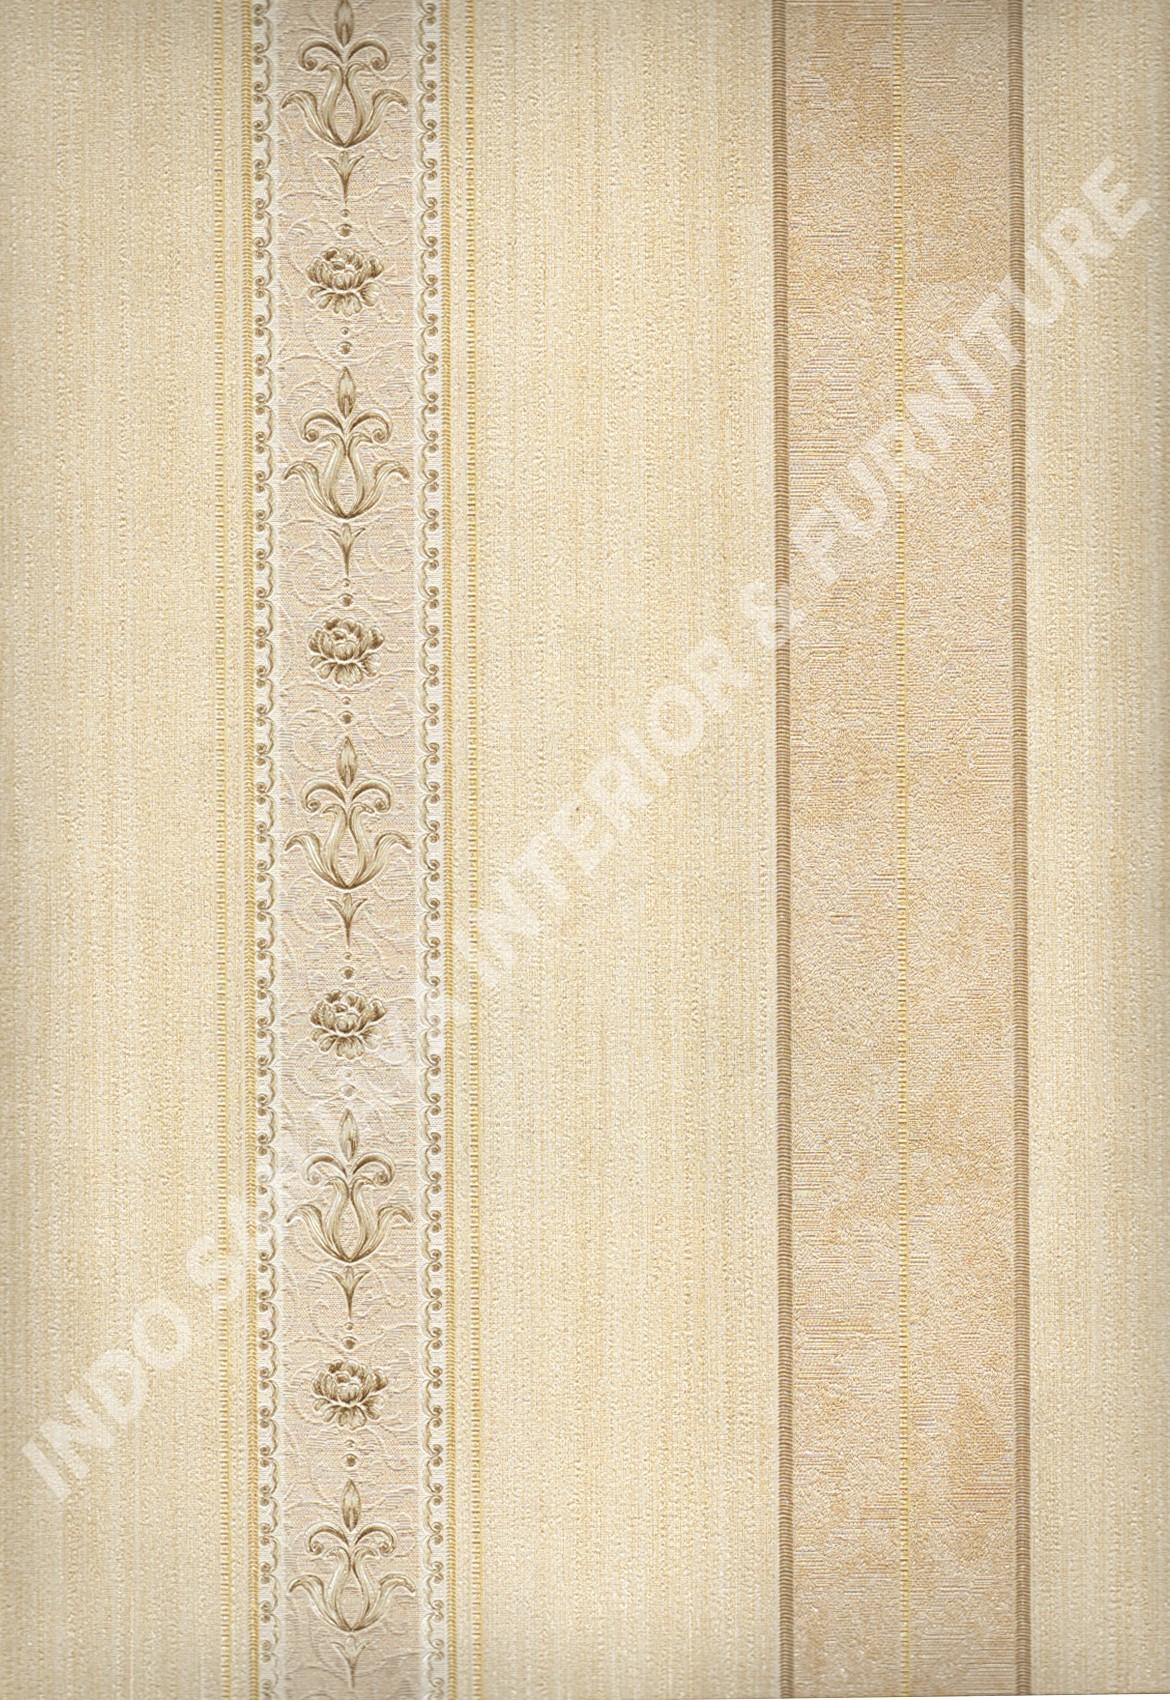 wallpaper   Wallpaper Klasik Batik (Damask) YG80202:YG80202 corak  warna